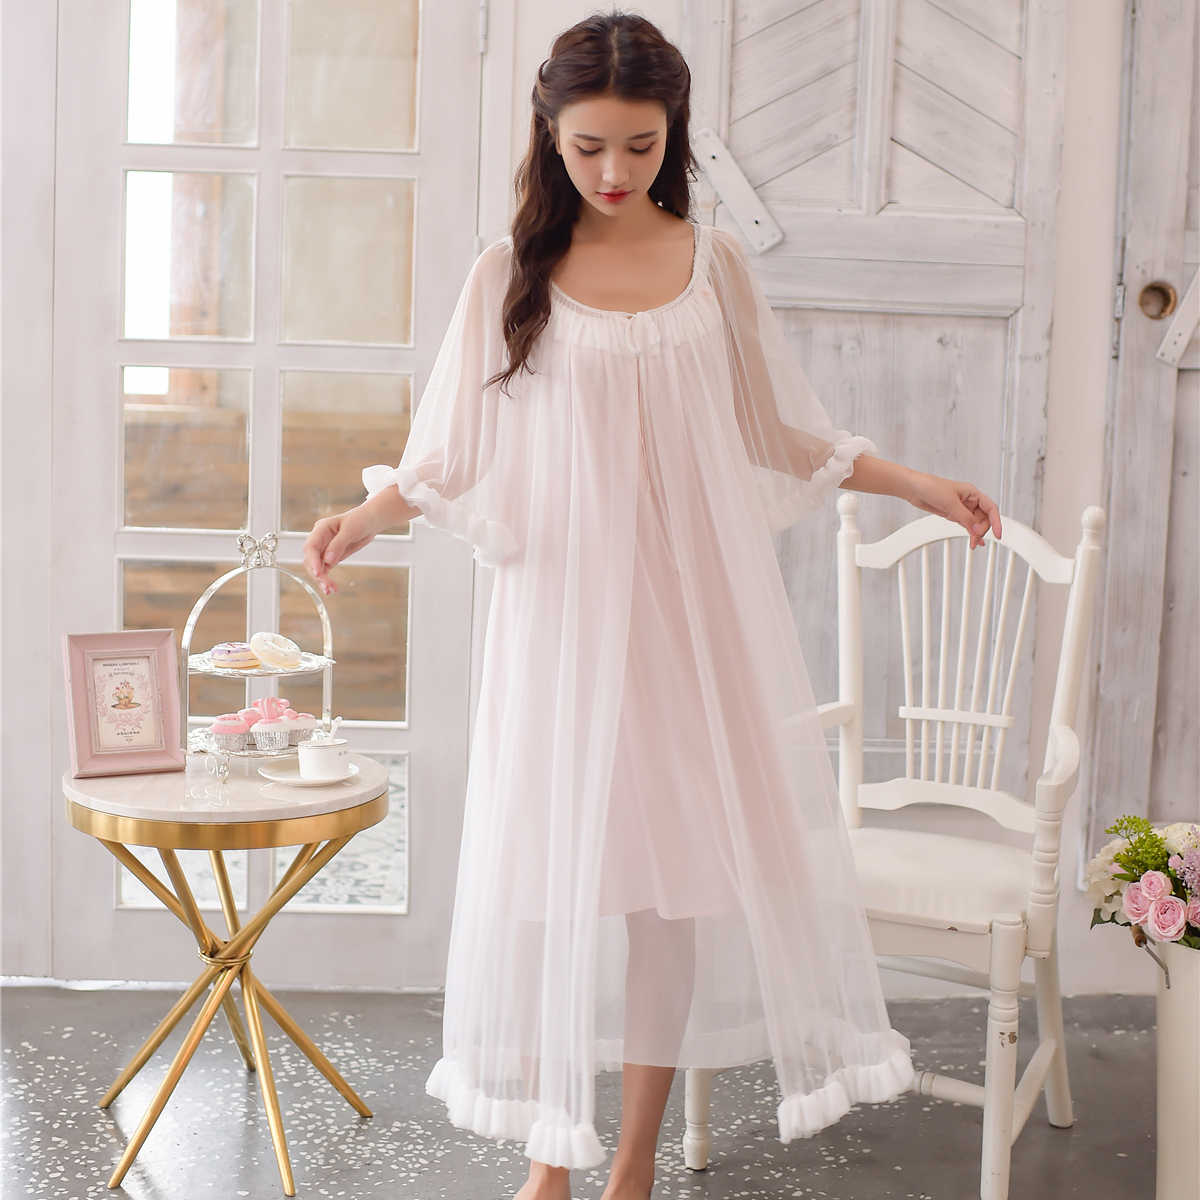 2018 Autumn 2PICS Vintage sleepwear Modal lining nightgown Princess design nightgown  long lace nightdress Arab Lady 92cf66b5d